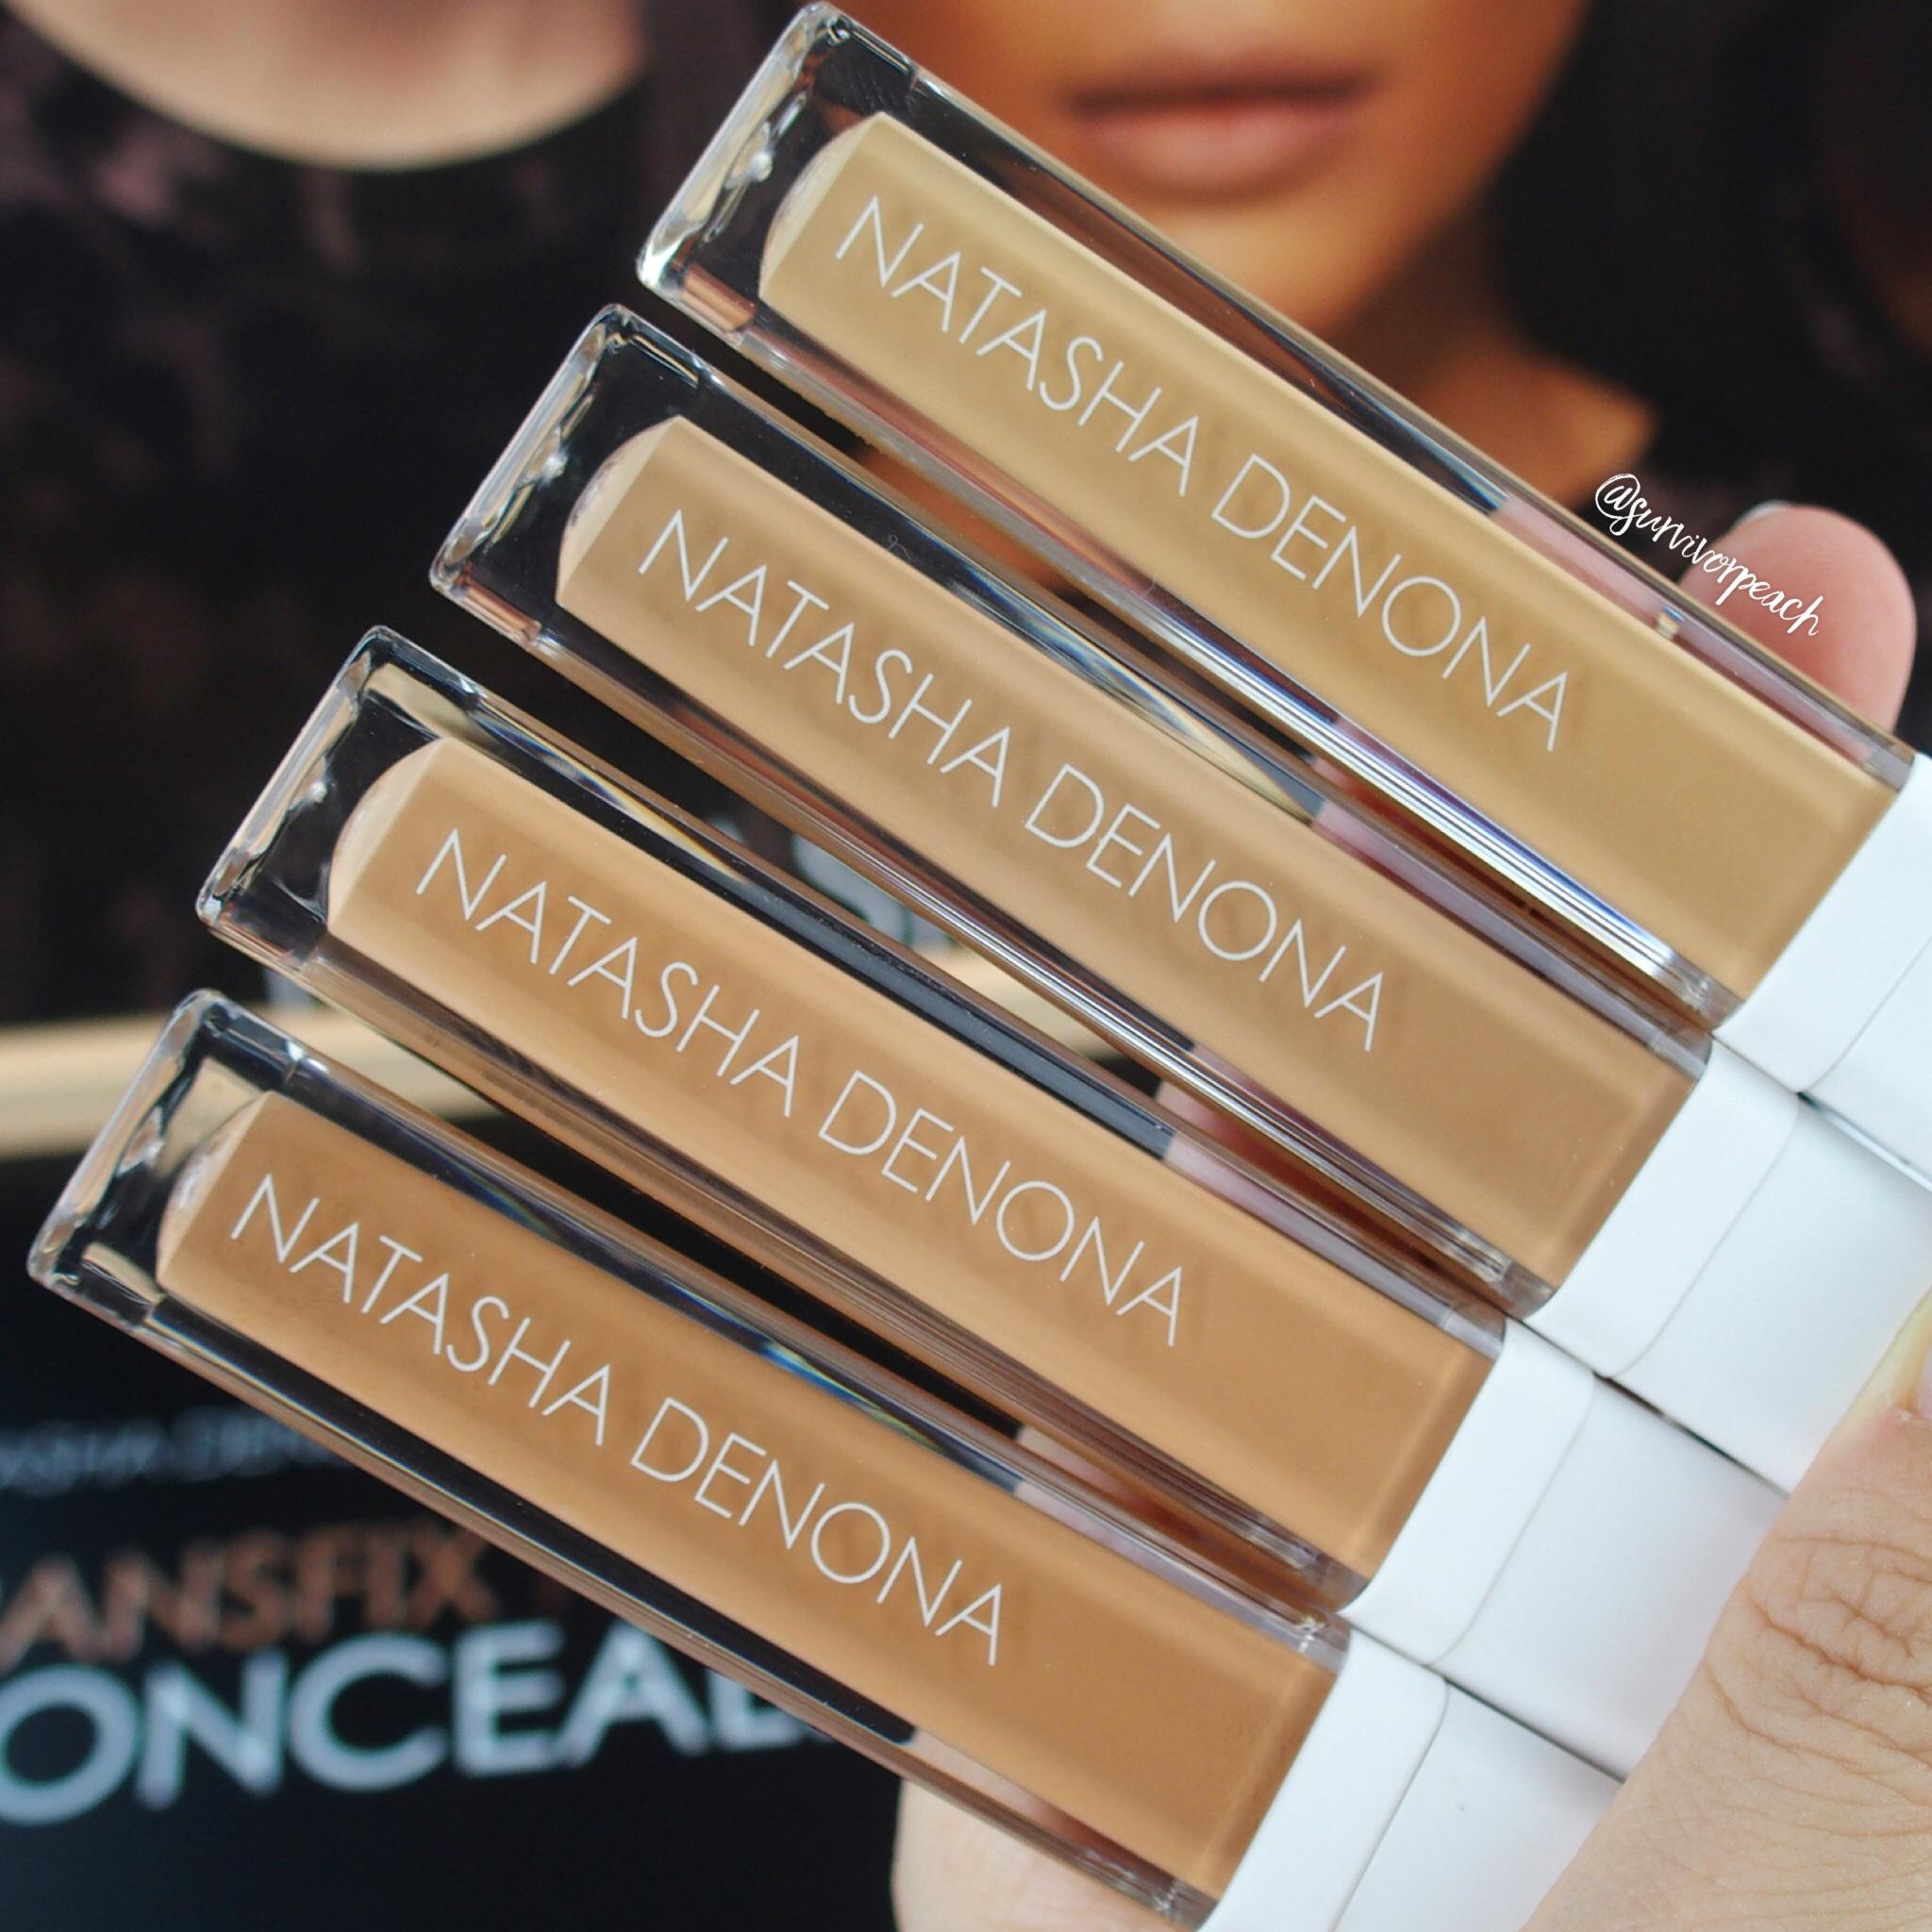 Natasha Denona Transfix Matte Concealers- 9WY Warm Yellow, 10 N Neutral, 11W Warm, 12W Warm